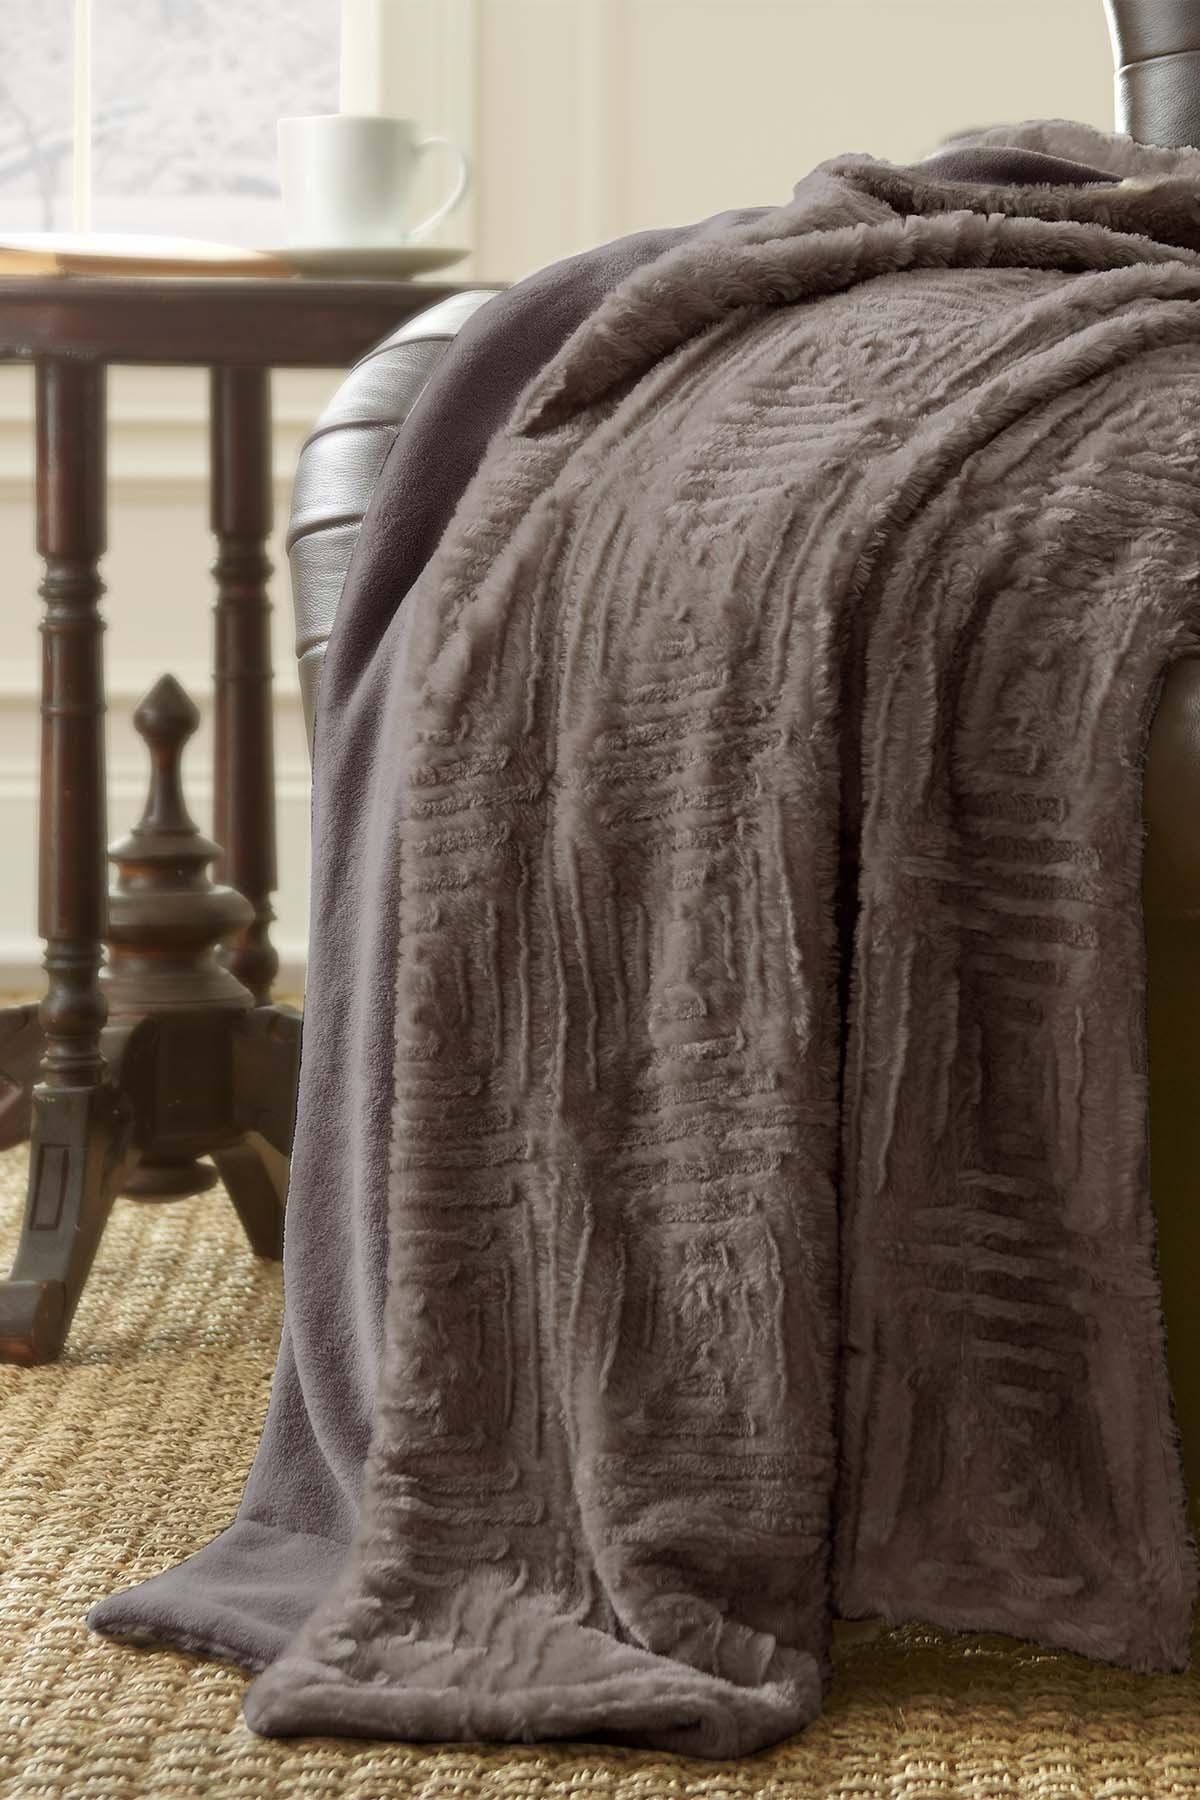 Modern Threads Luxury Faux Fur Throw - Dark Gray at Nordstrom Rack